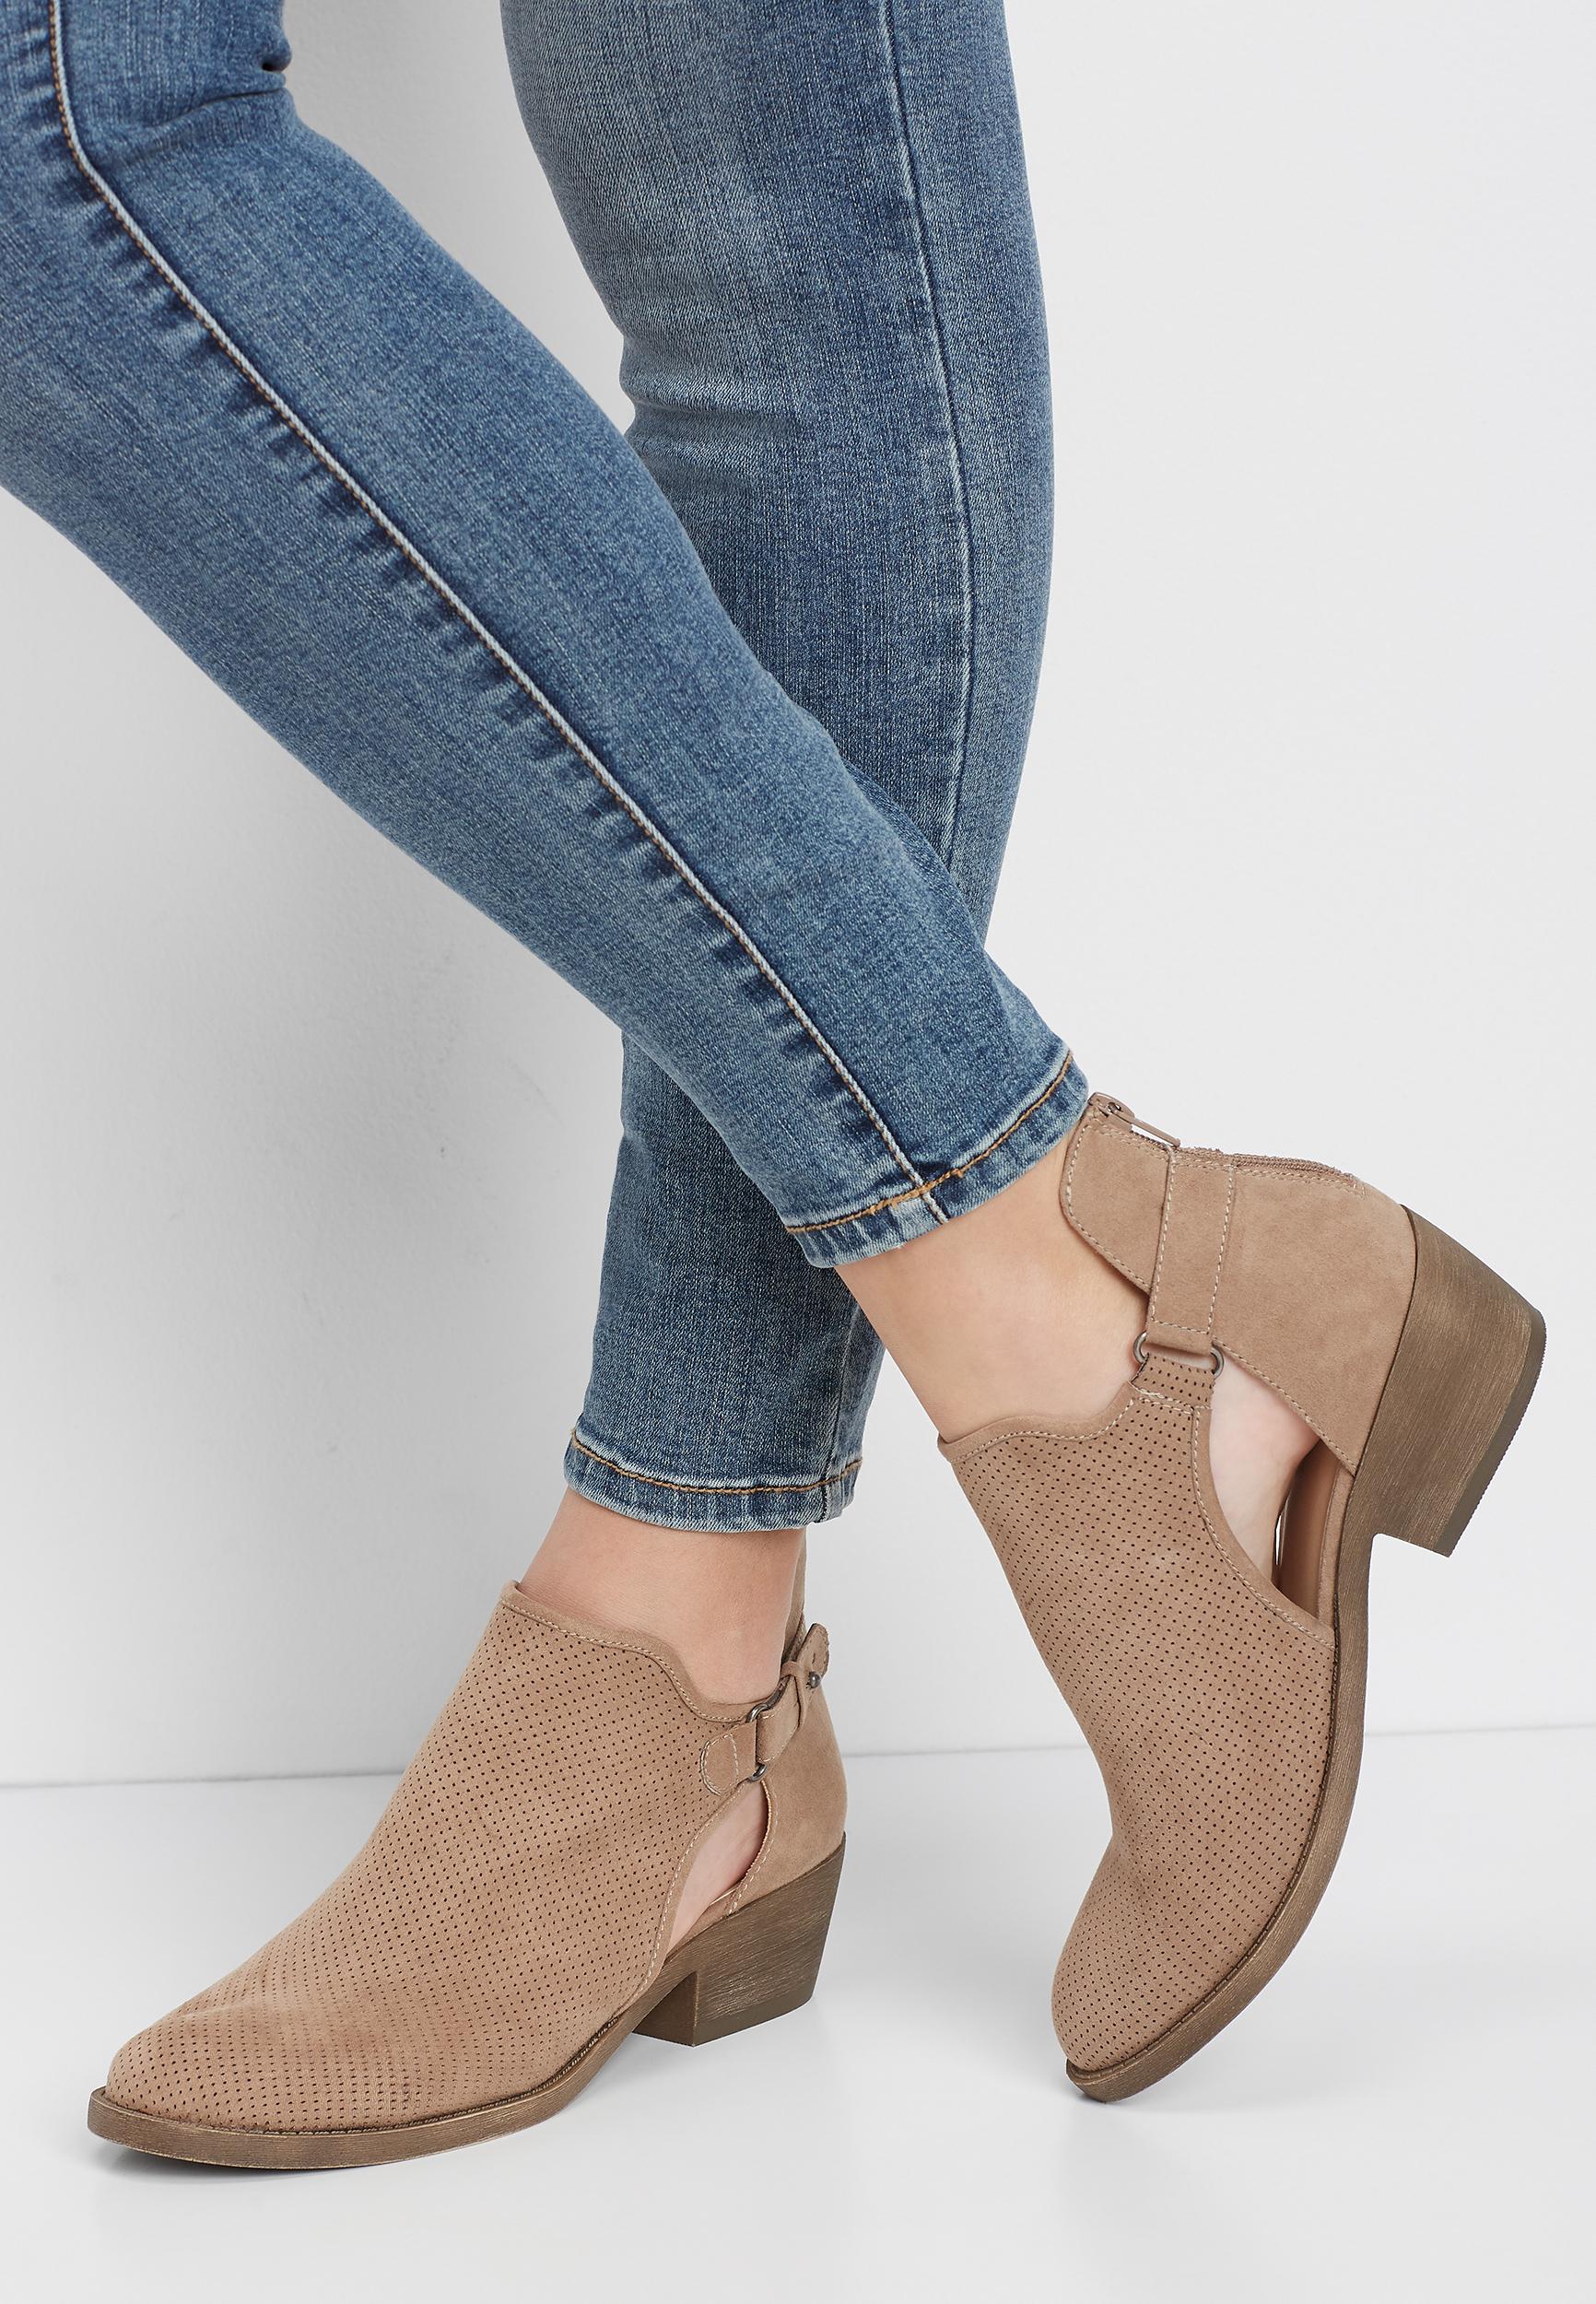 Lothian Nora Women/'s Side Zip Ankle Boots US 9 Black//White Dalmatian Print